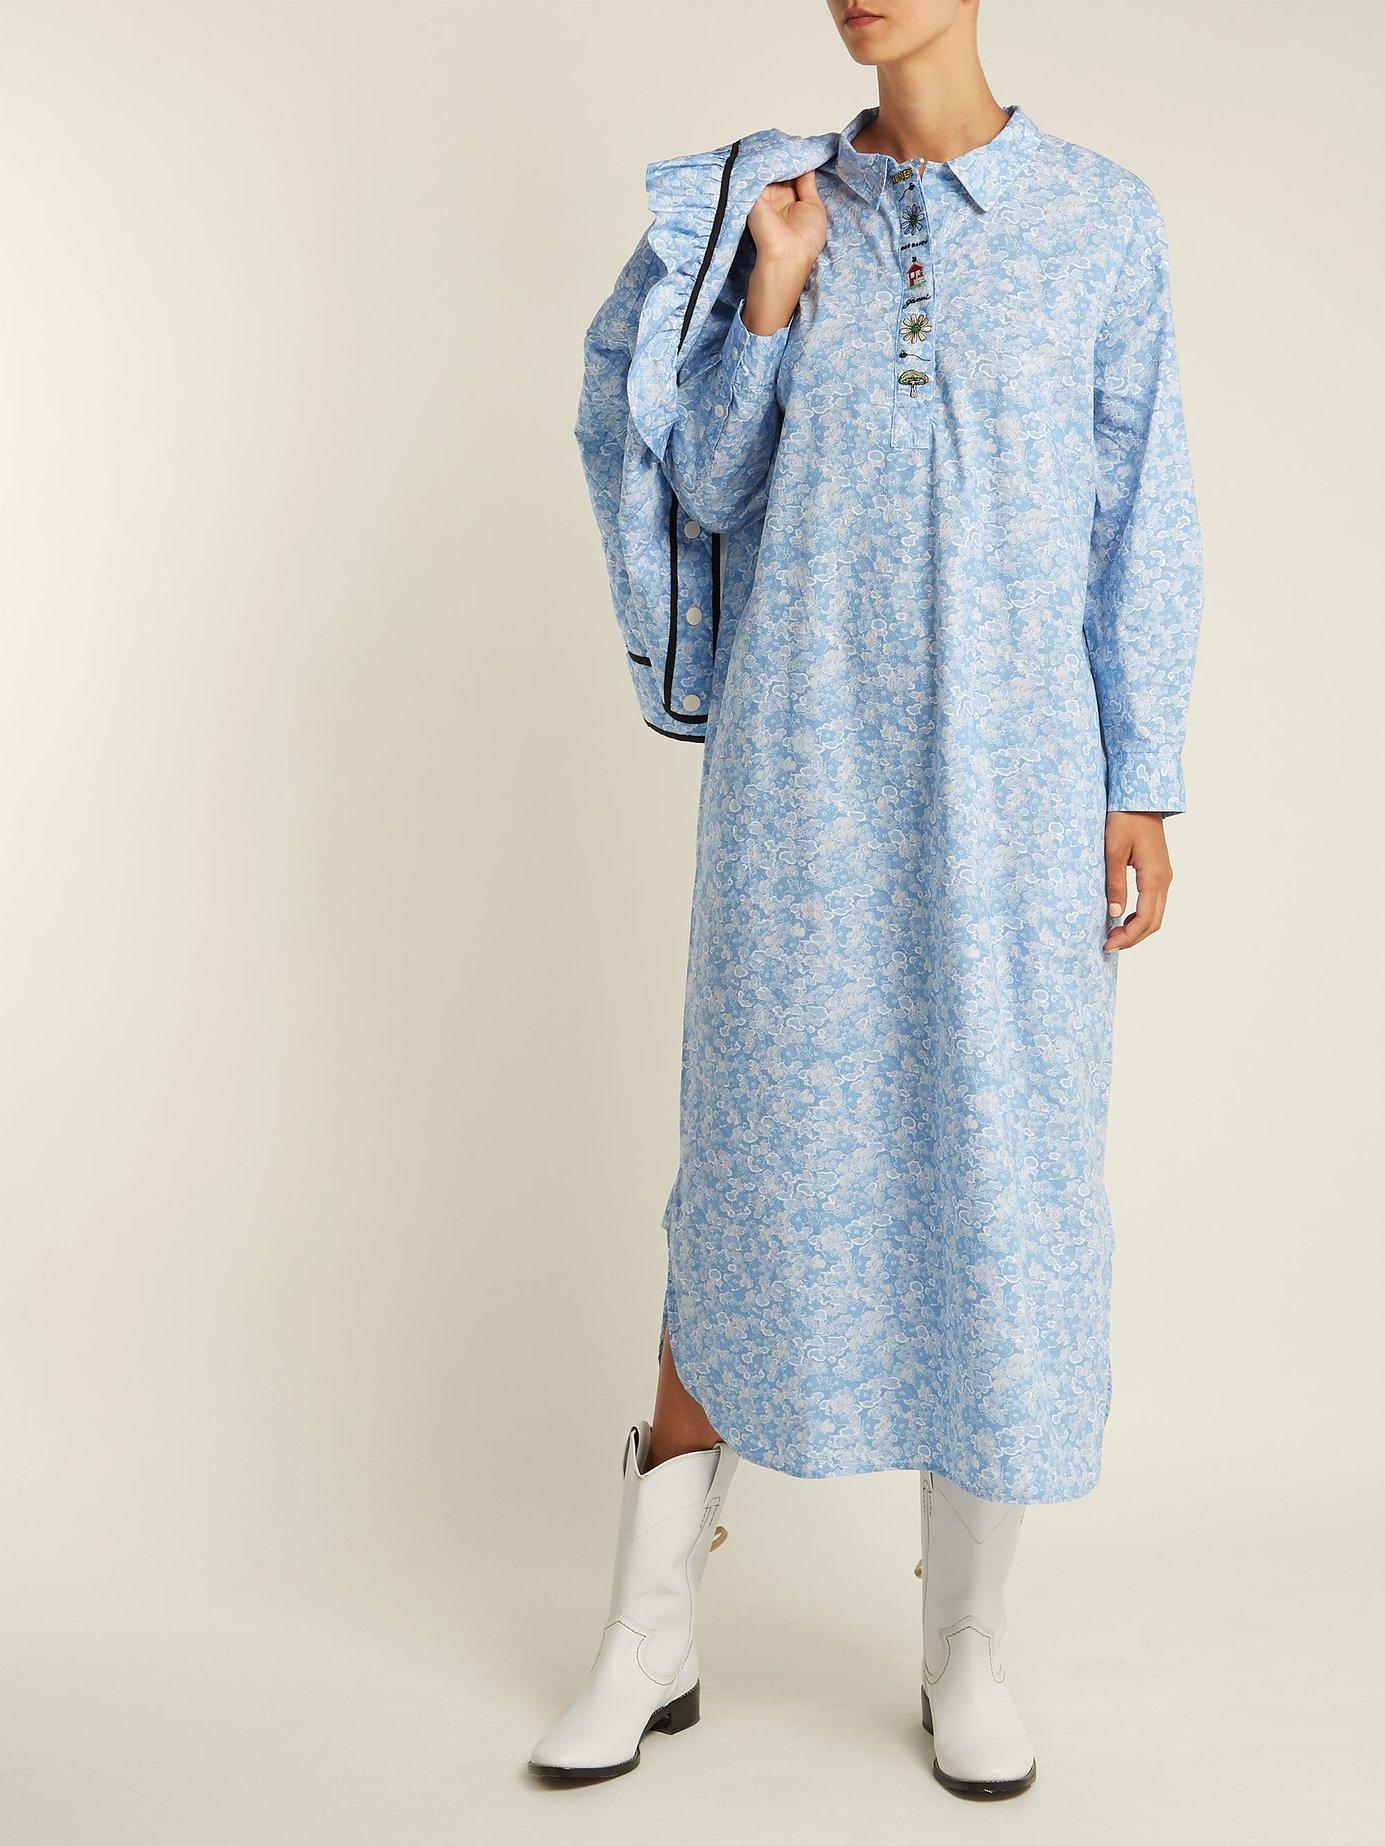 Sage floral-print long-sleeve dress by Ganni